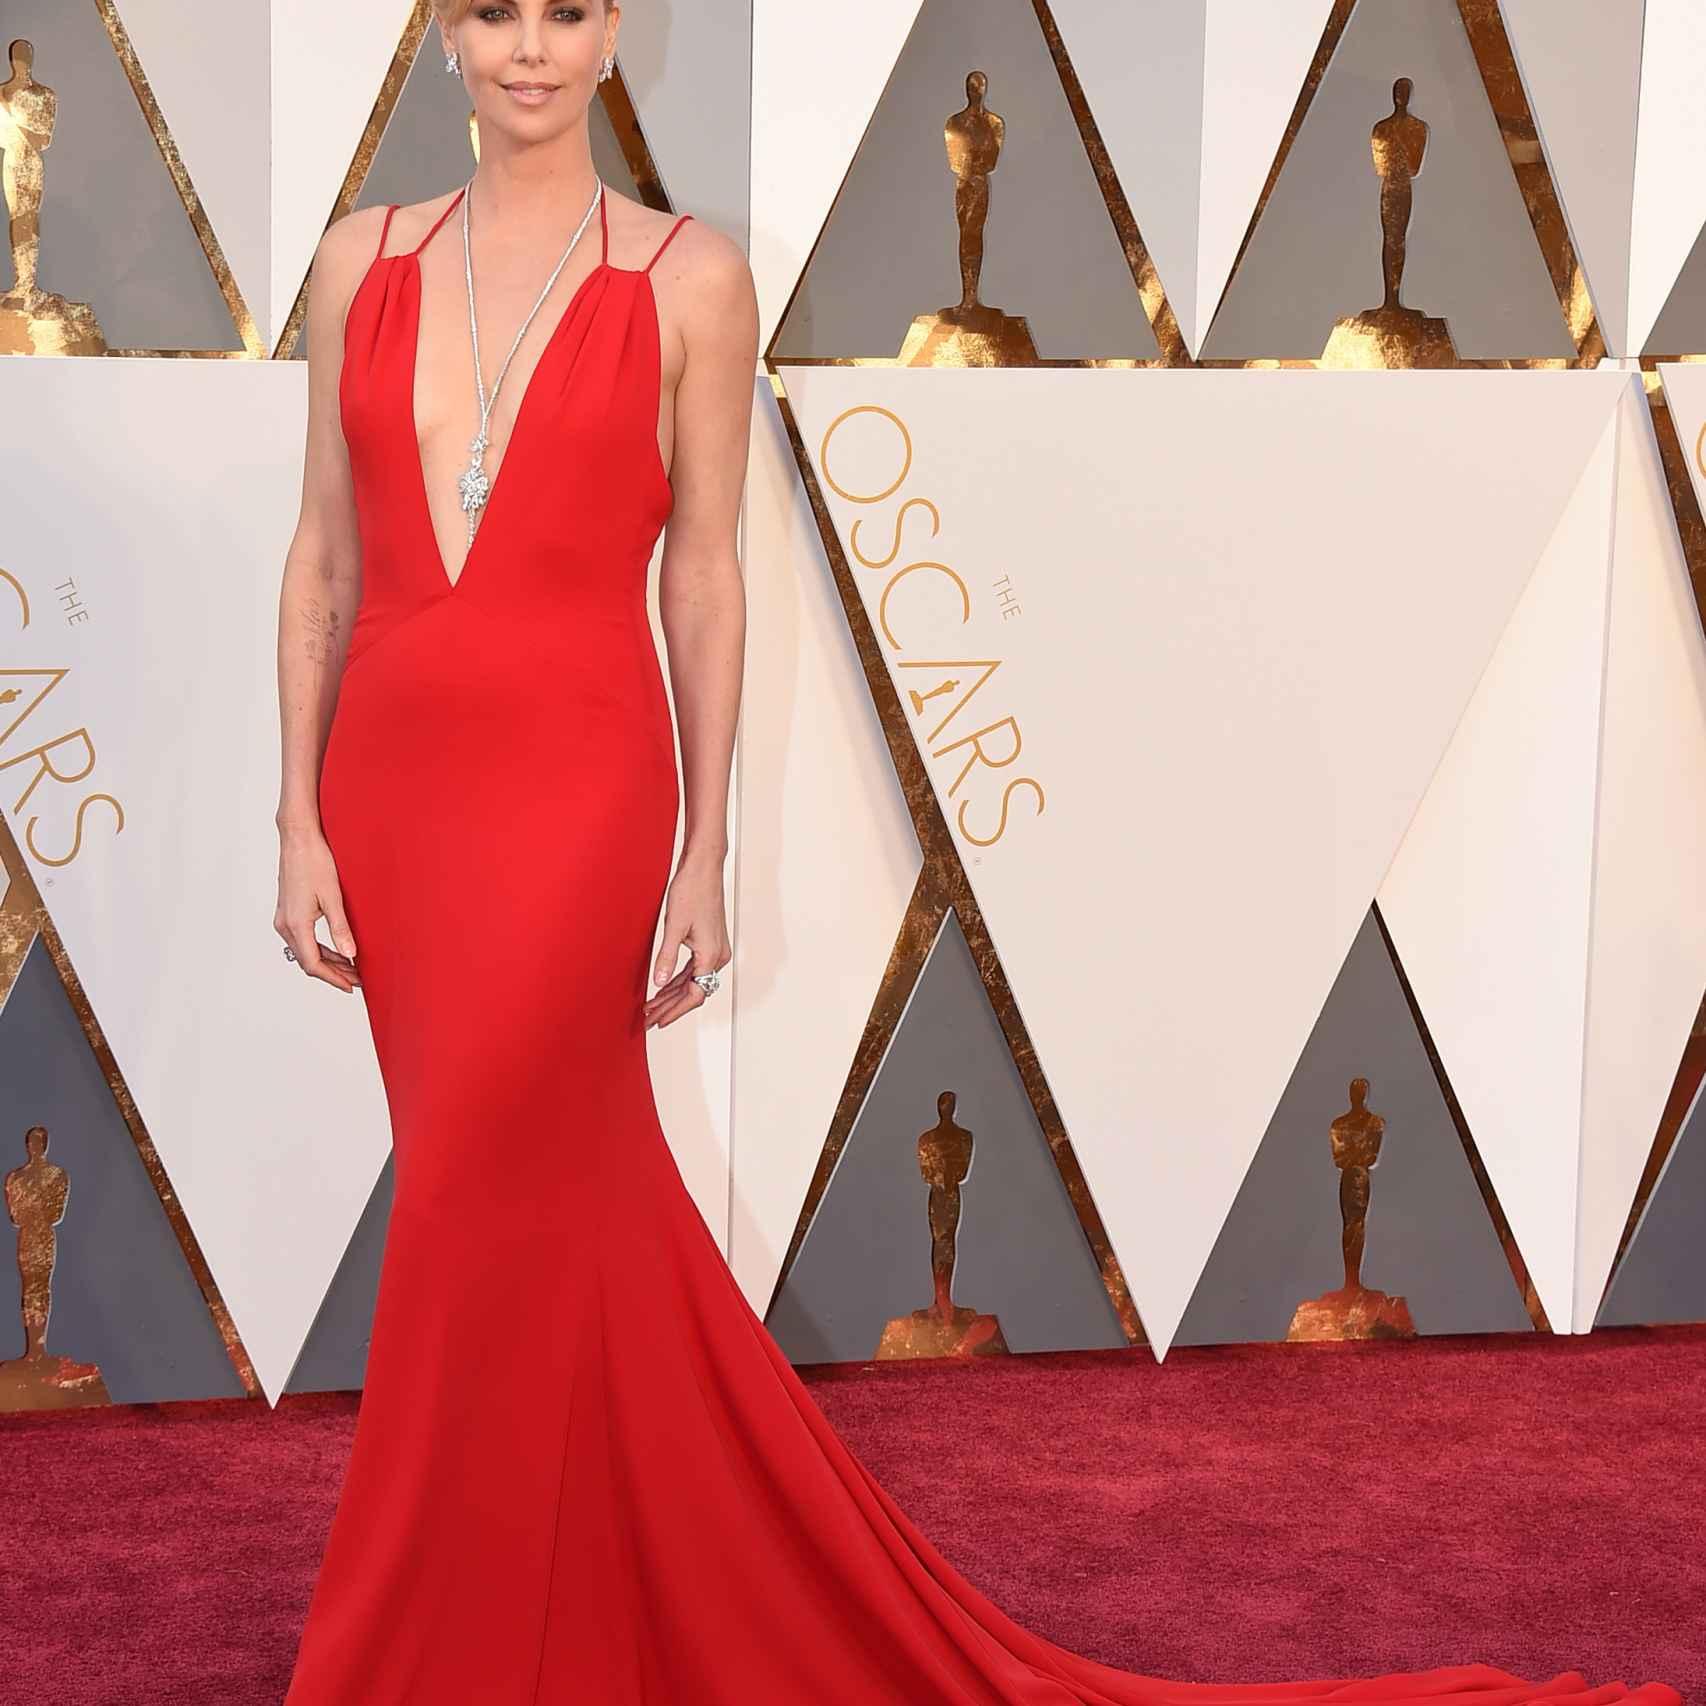 Charlize Teron con un espectacular vestido rojo de Dior